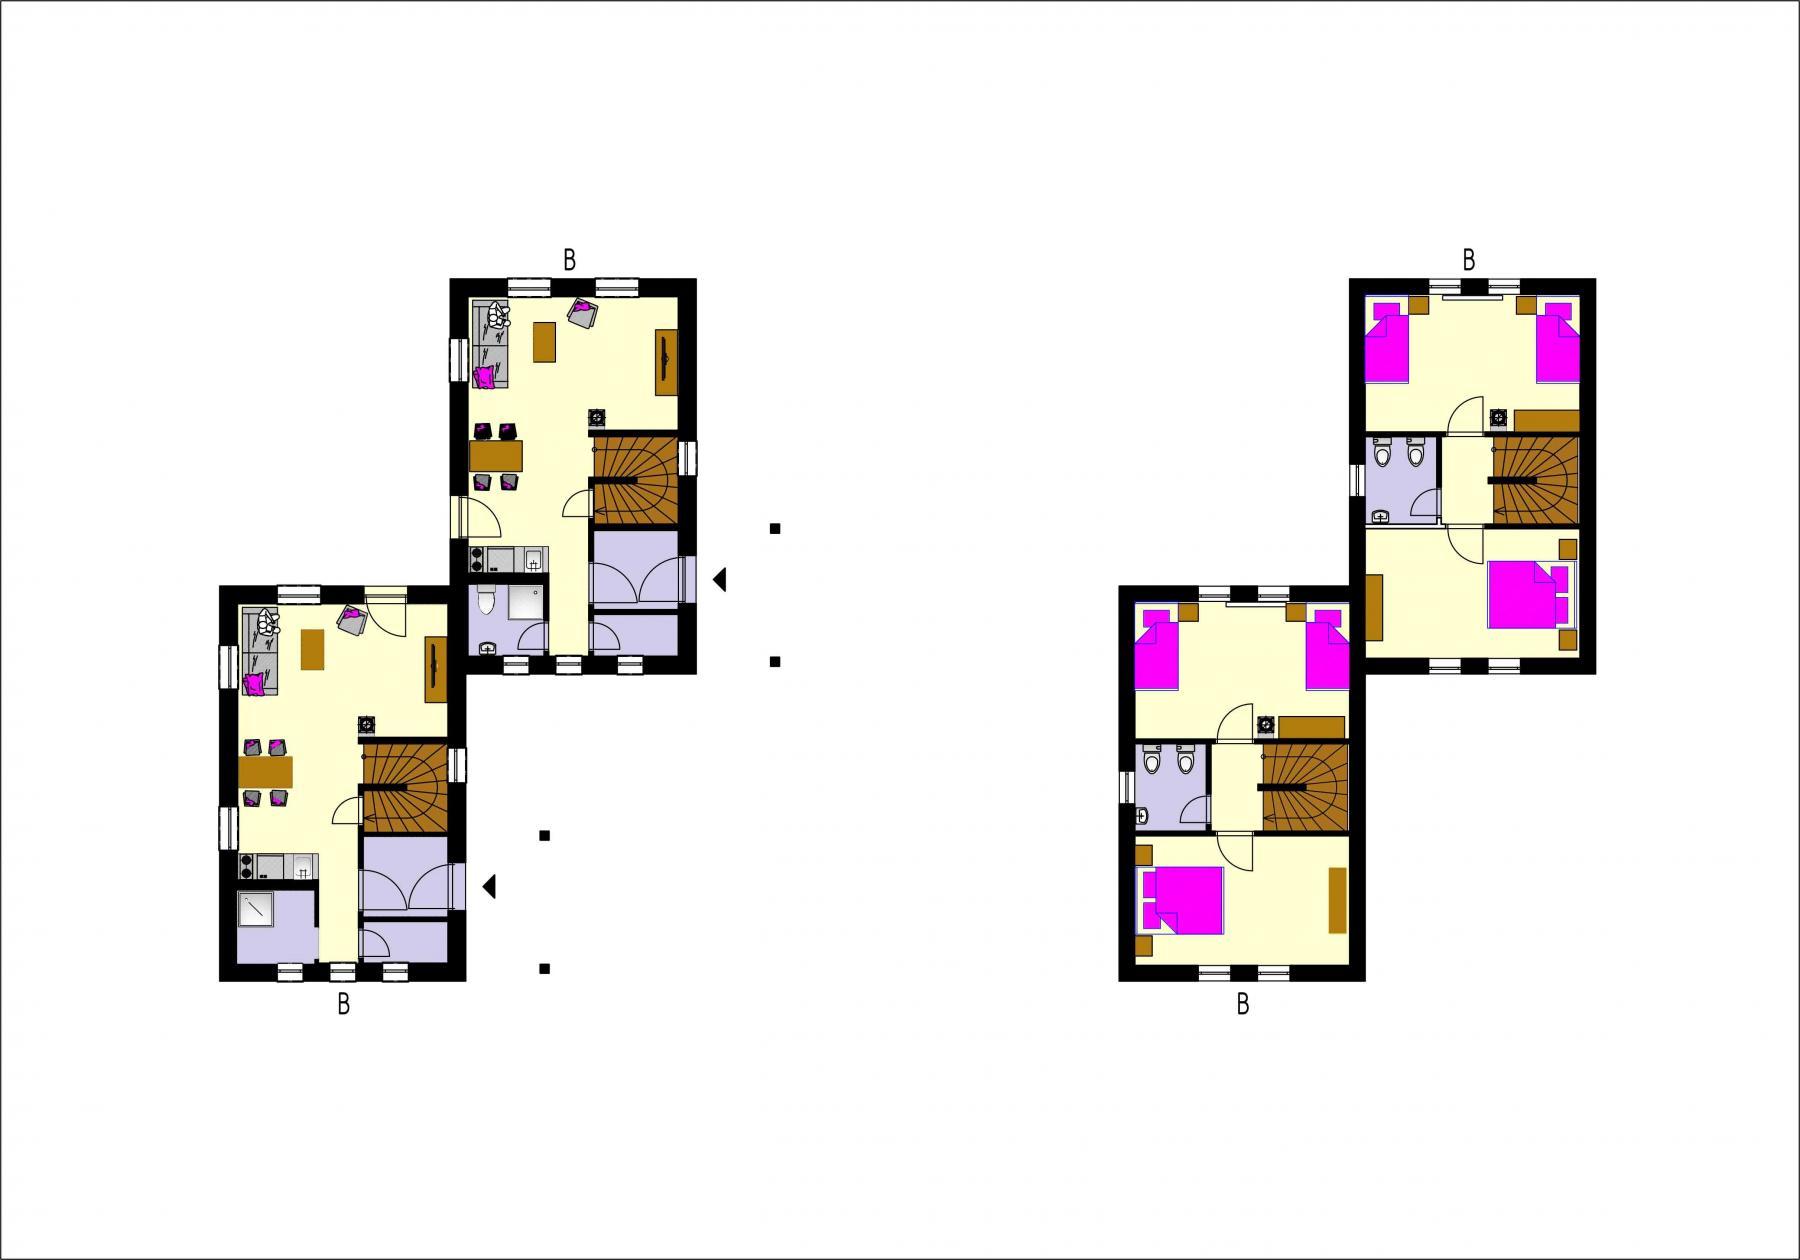 Gothal - ubytovanie na Liptove - pôdorys chalupy typu B - dvojdom